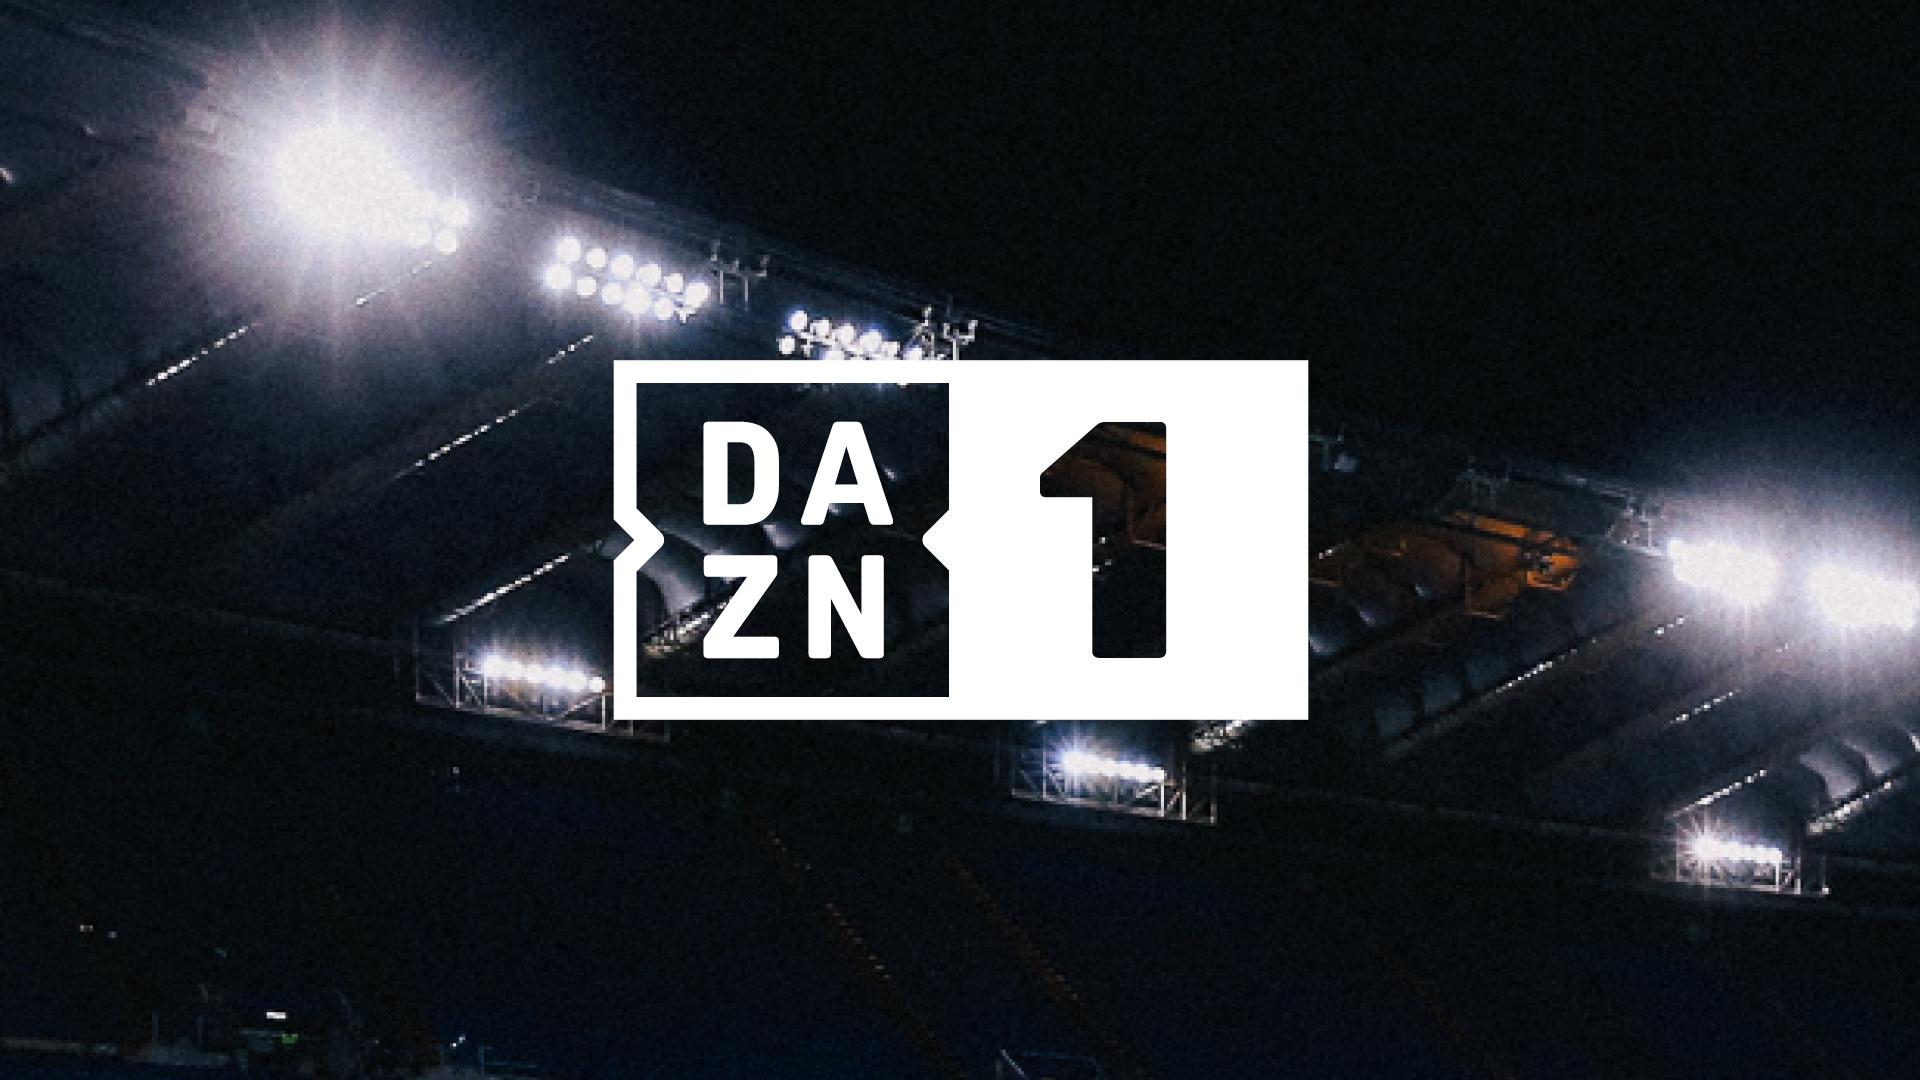 DAZN 1 (canale 209 Sky Sport), Palinsesto 14 - 20 Febbraio